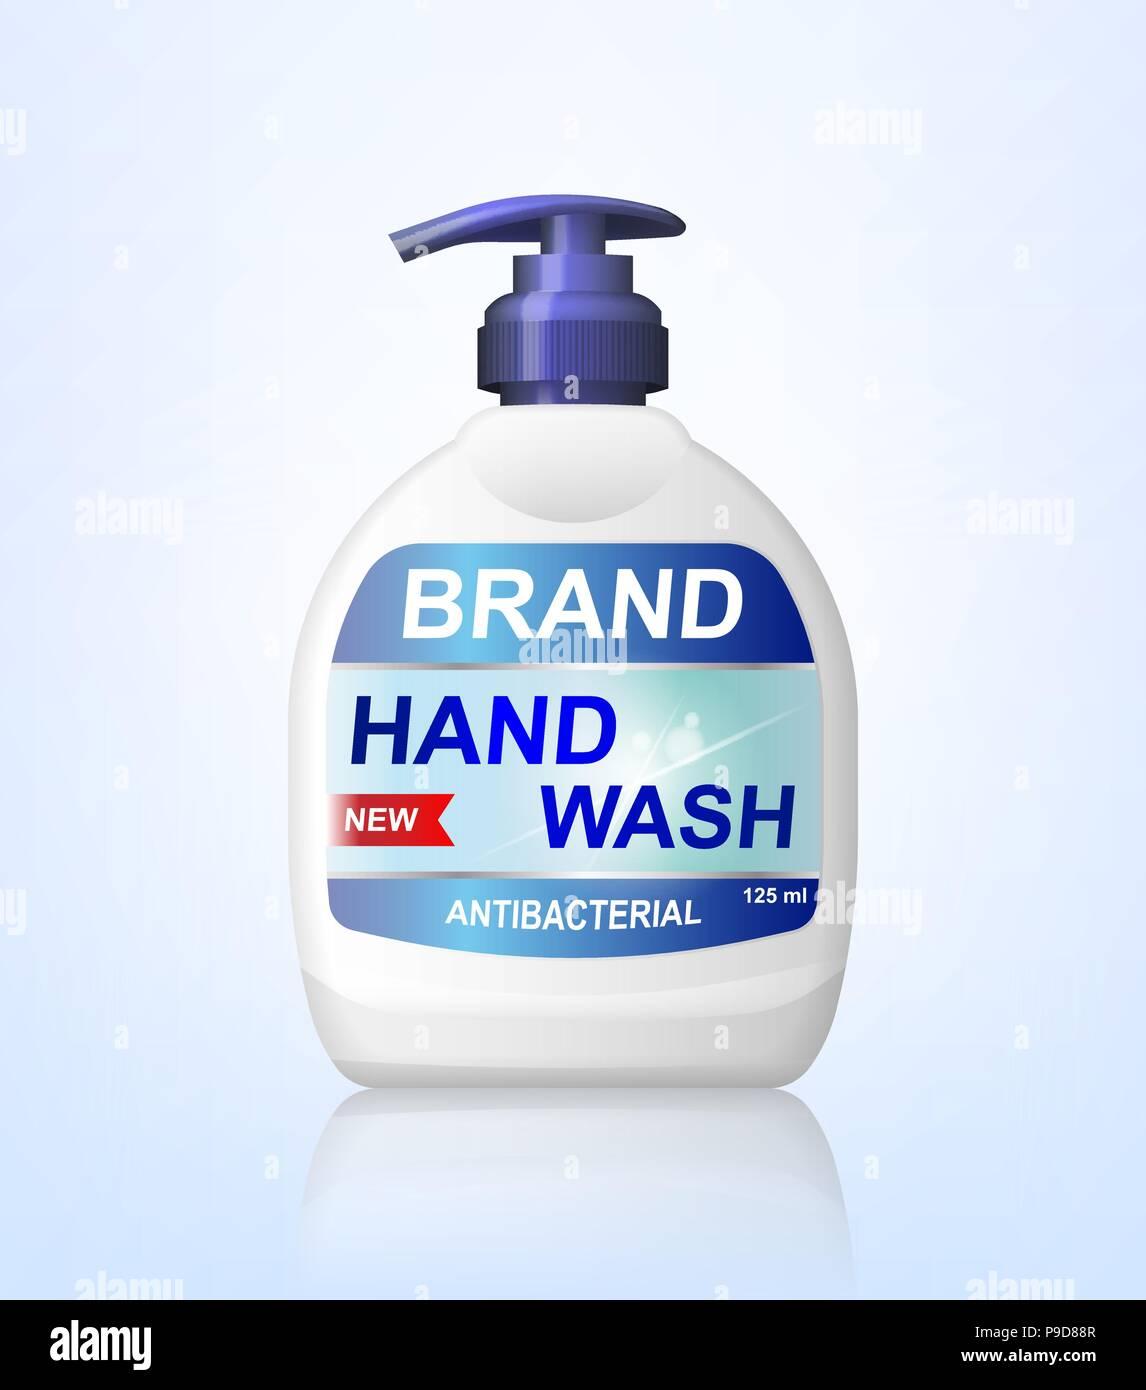 Antibacterial hand wash gel ads, dispenser bottle mockup isolated. 3d realistic Soap antiseptic bottle. Hygiene product package design. vector illustration - Stock Image